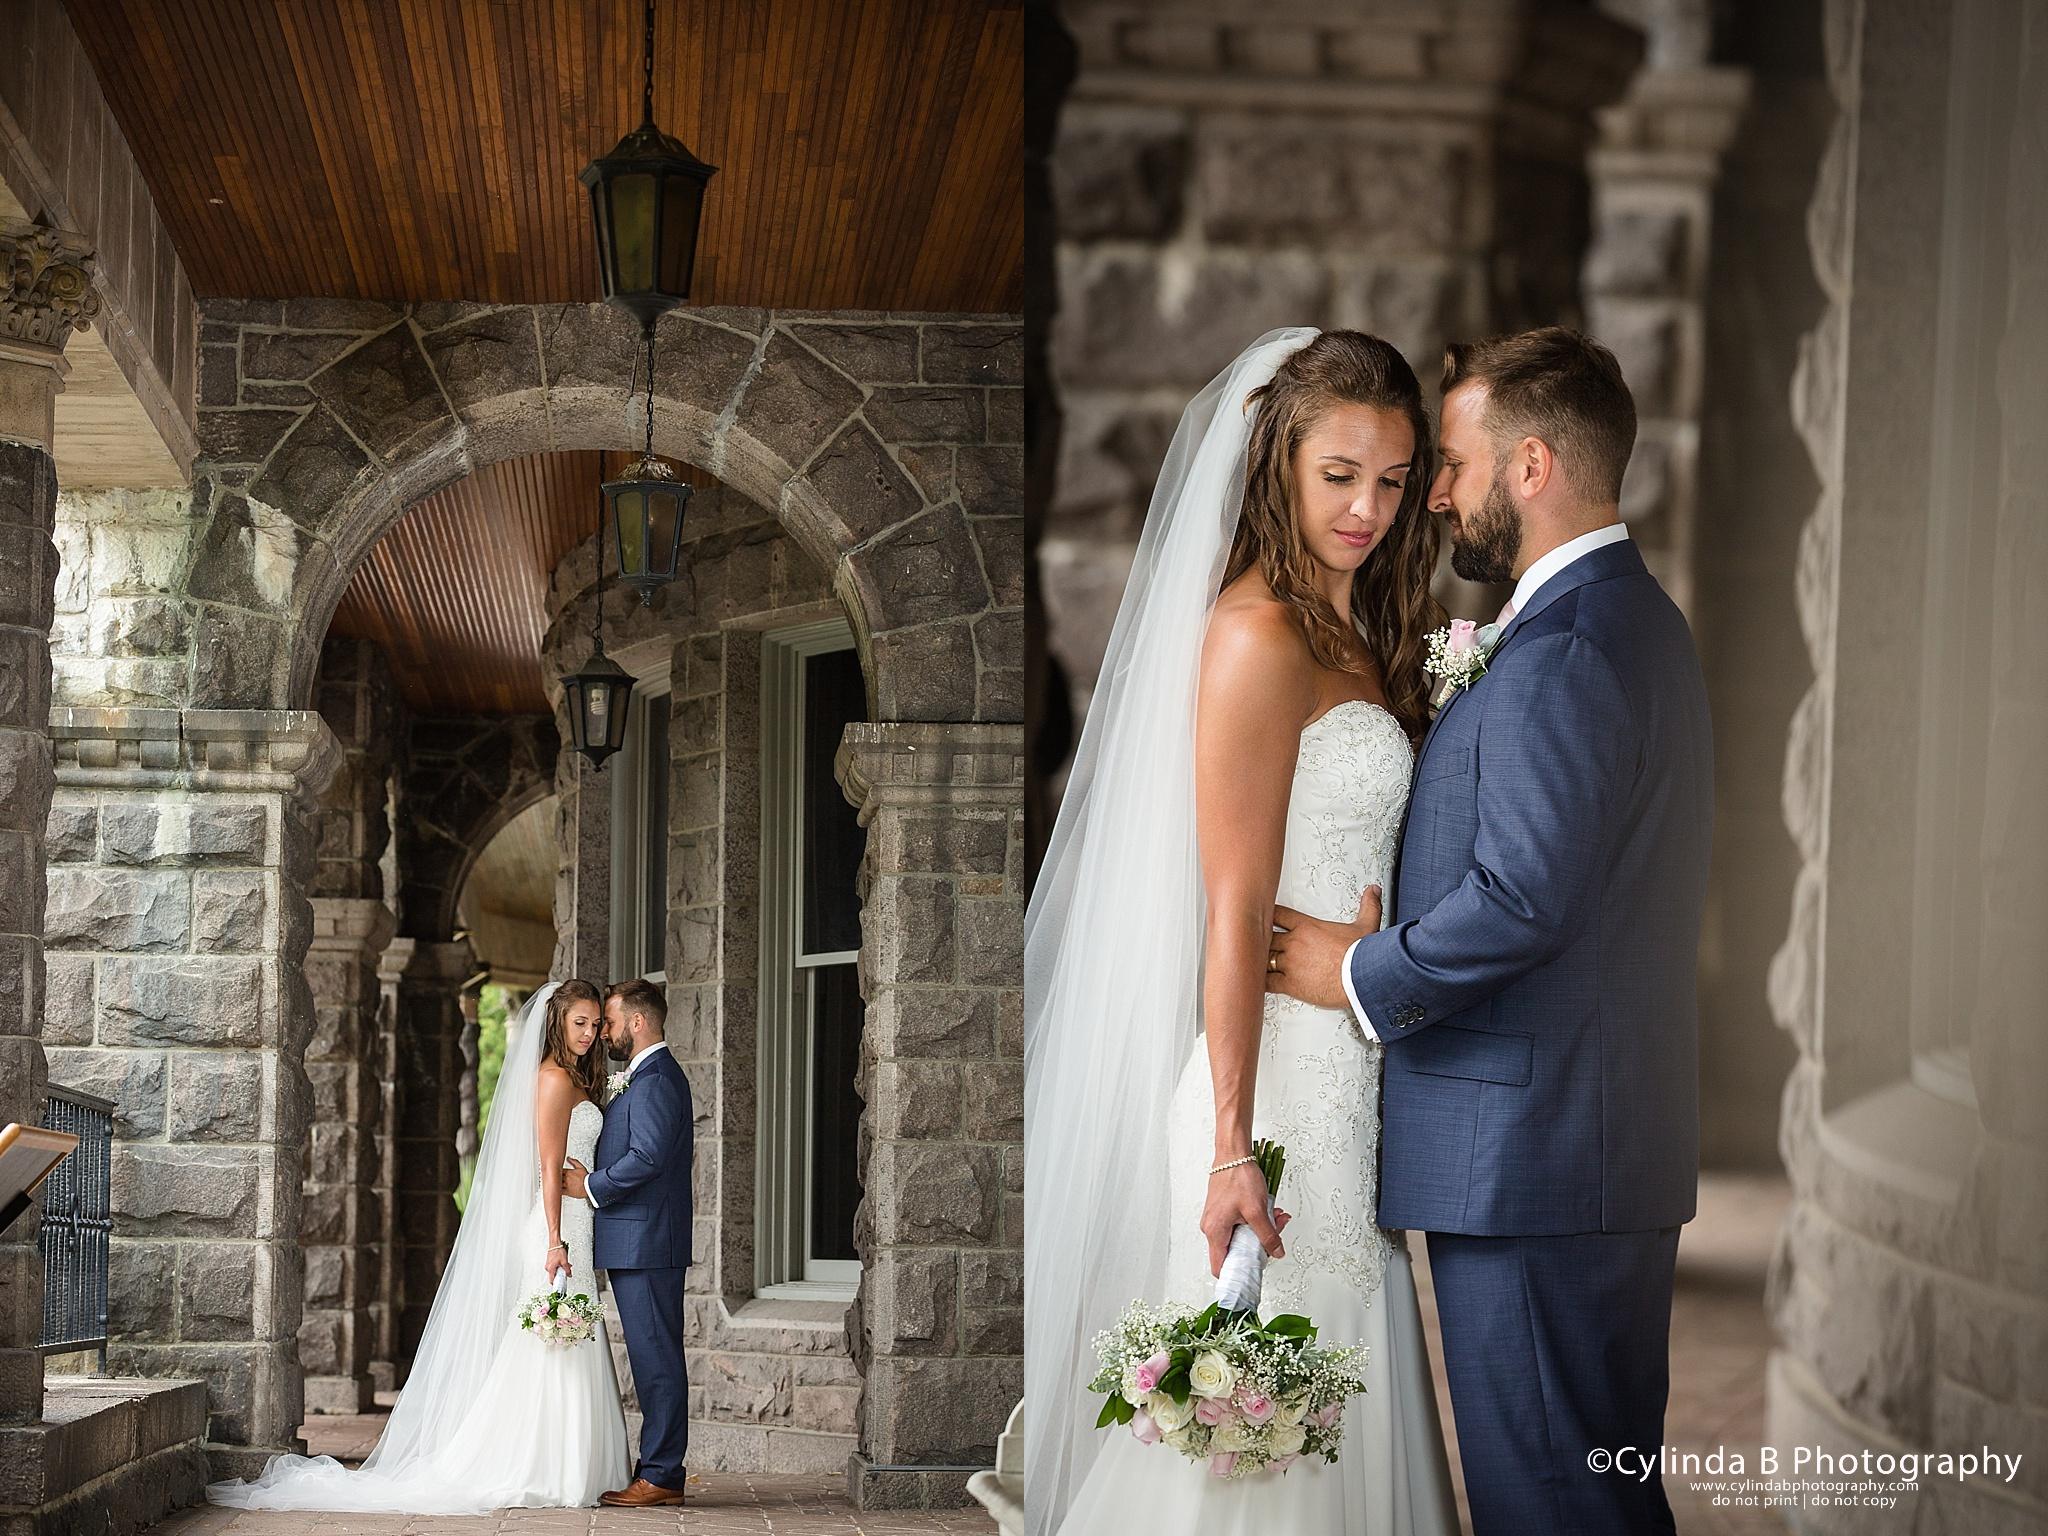 Boldt Castle Wedding, Alexandria Bay, Wedding, Photograper, Cylinda B Photography-29